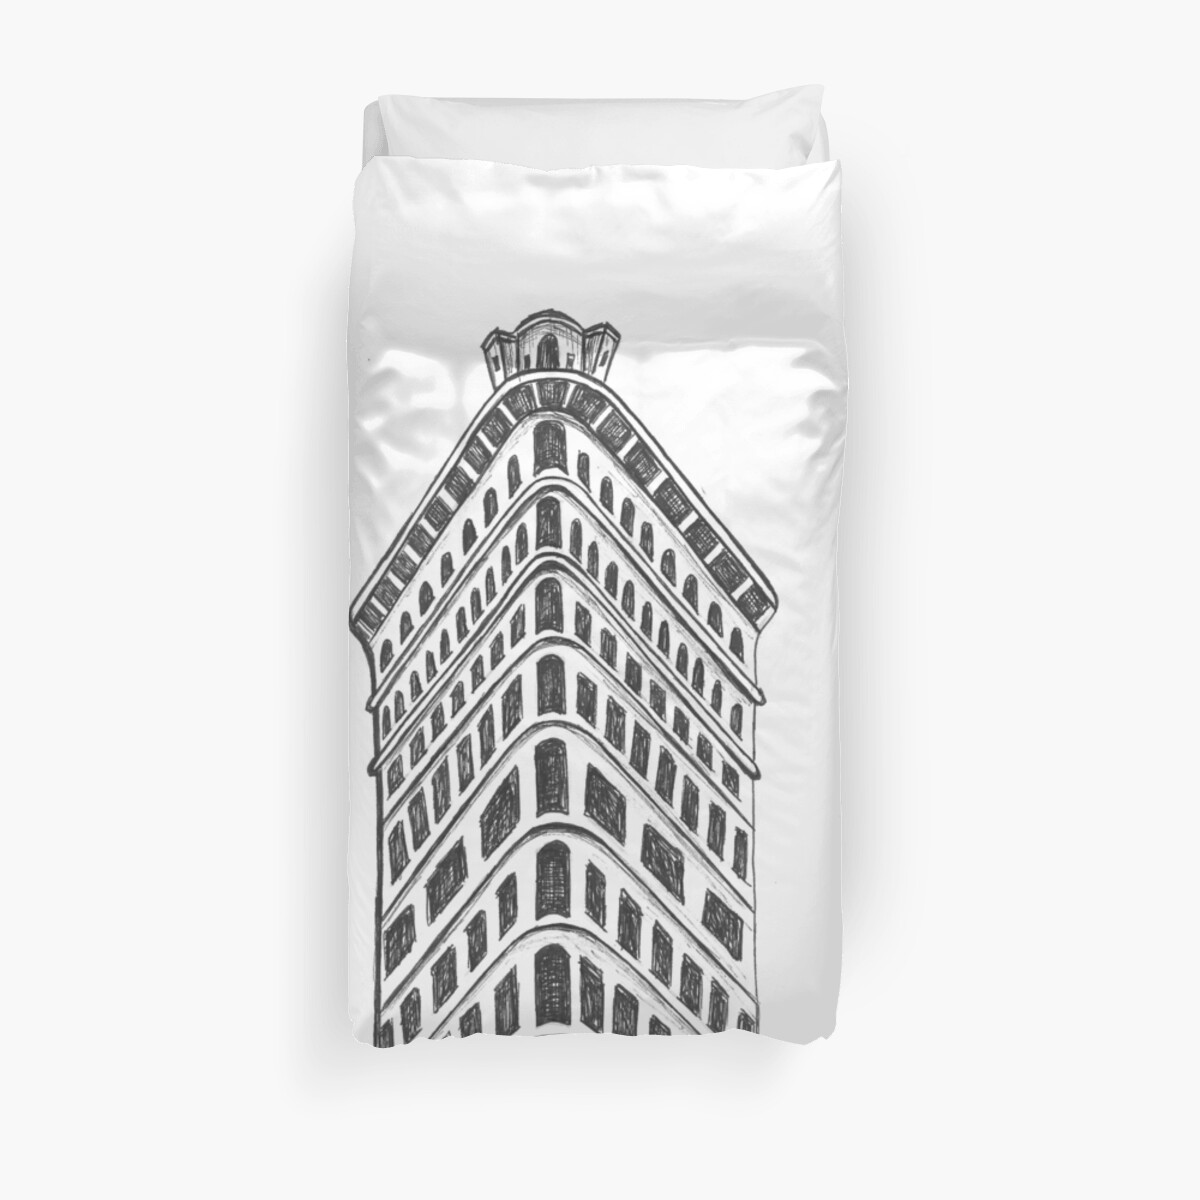 Flatiron Building by pineapplestreet